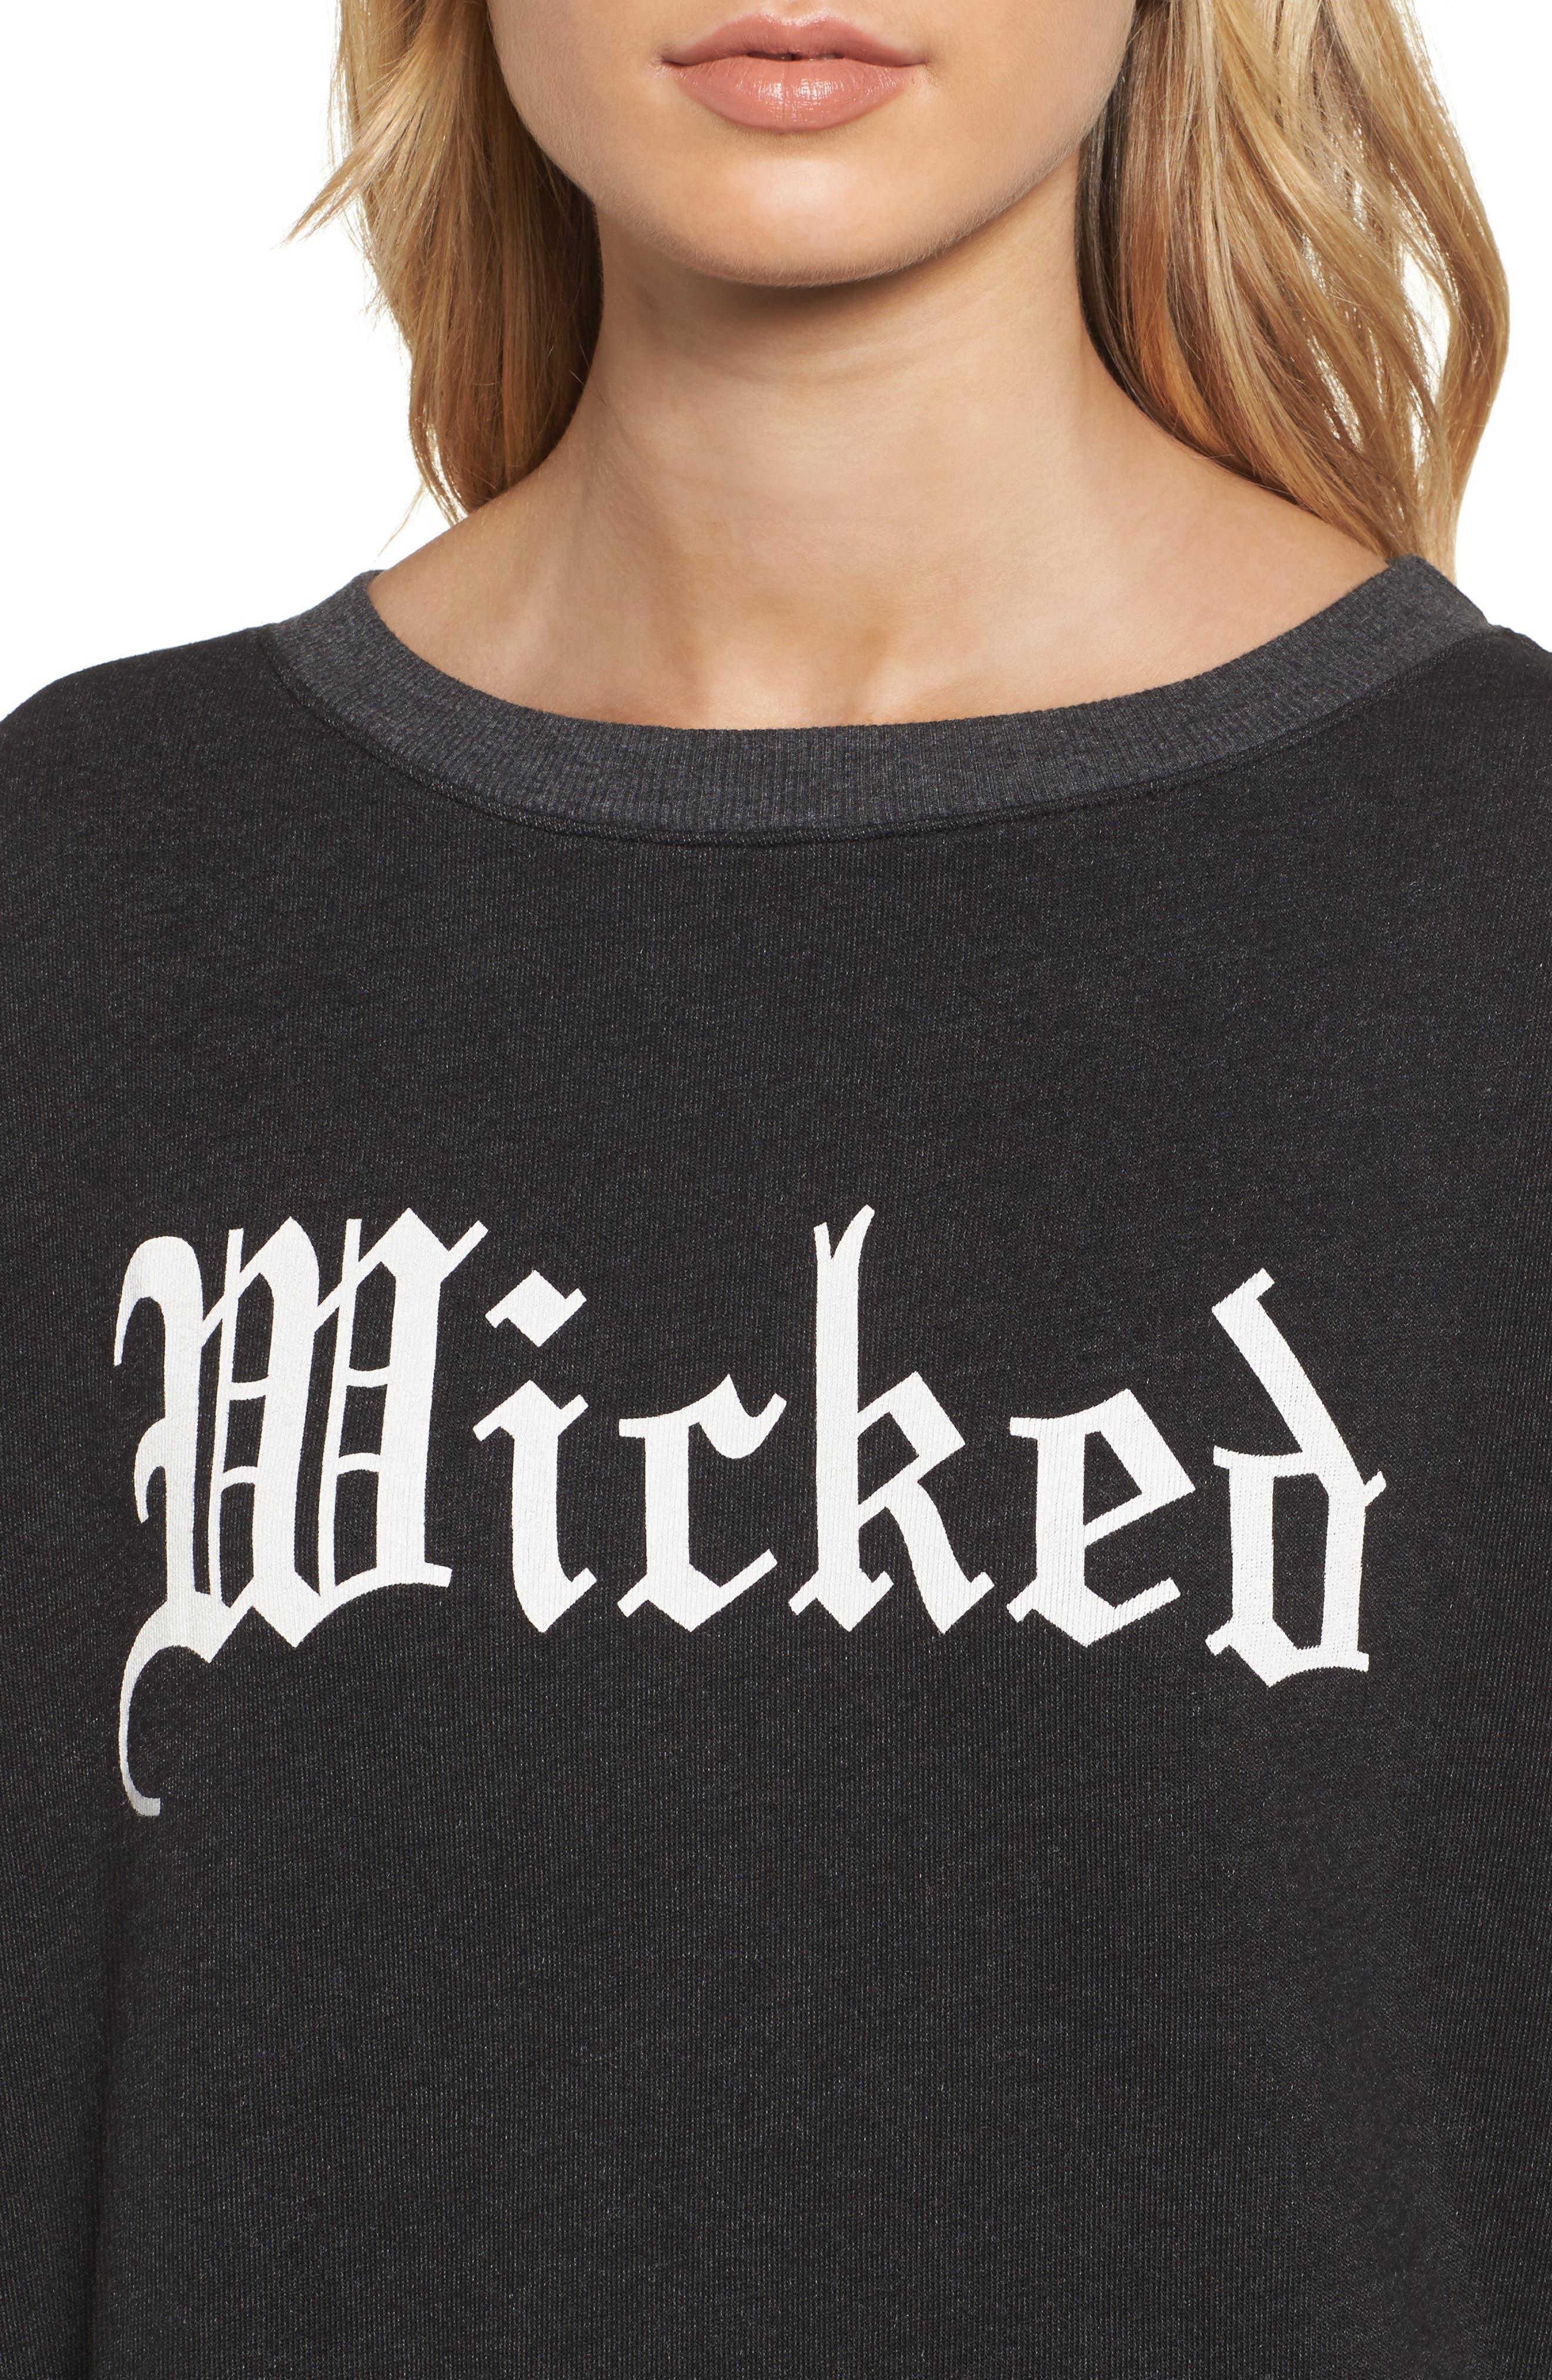 Wicked Sweatshirt,                             Alternate thumbnail 4, color,                             001